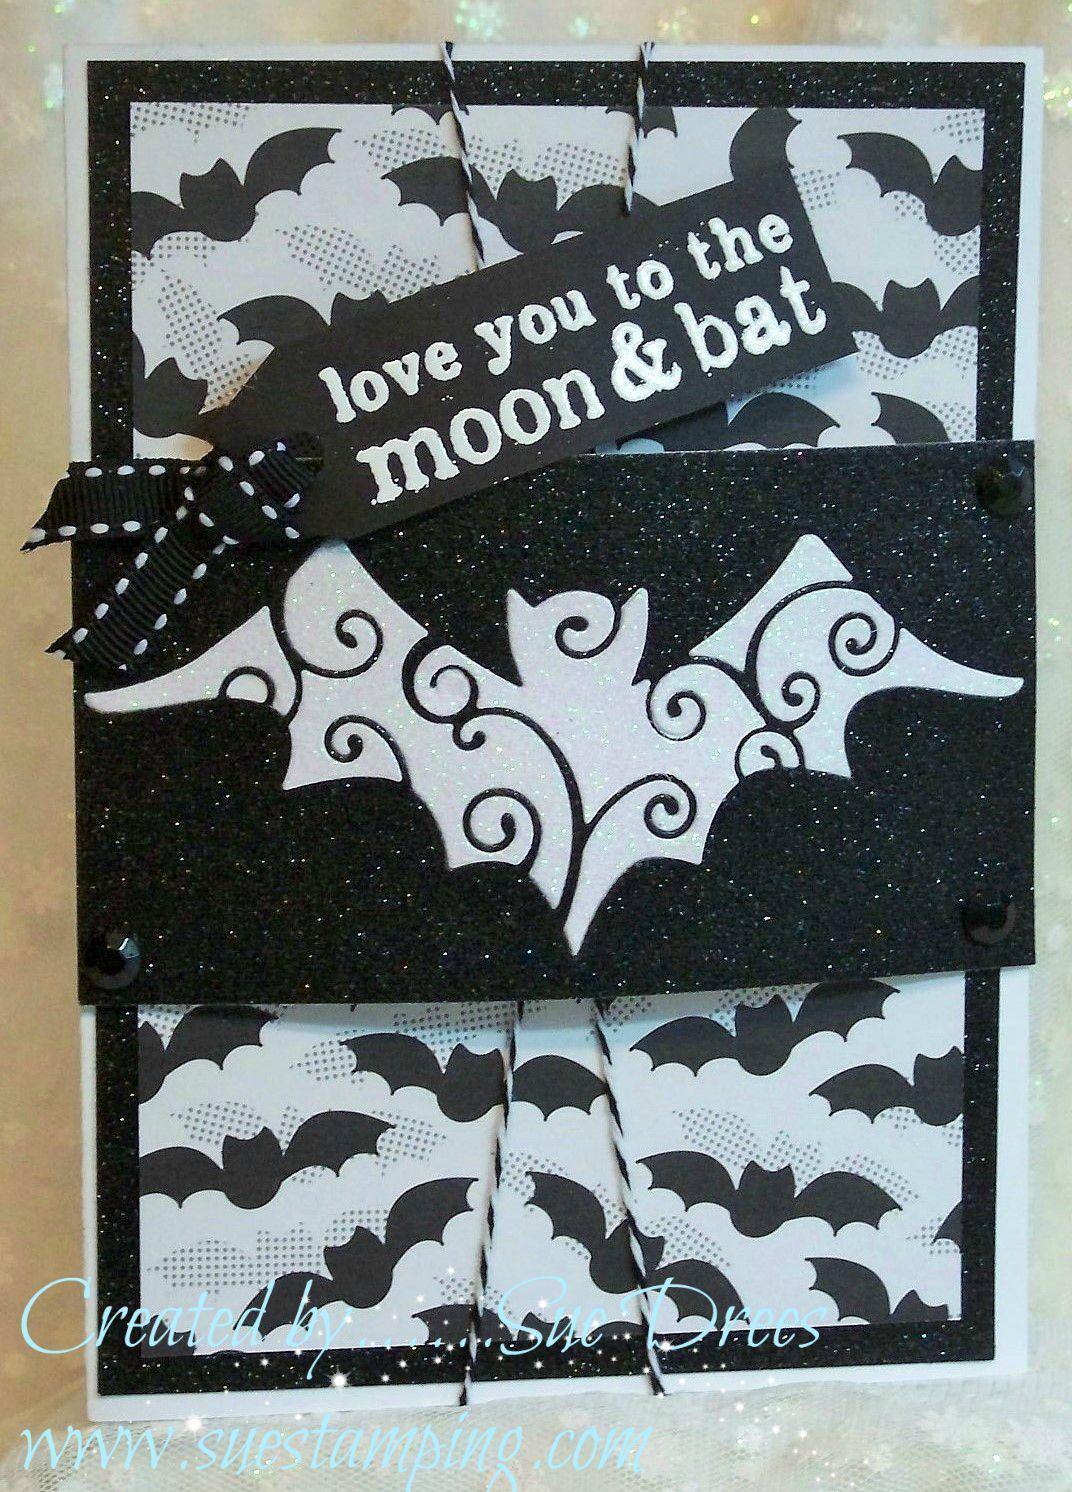 Buffalo Stamps & Stuff: BSS MONDAY IDEA -Bat Overlay on